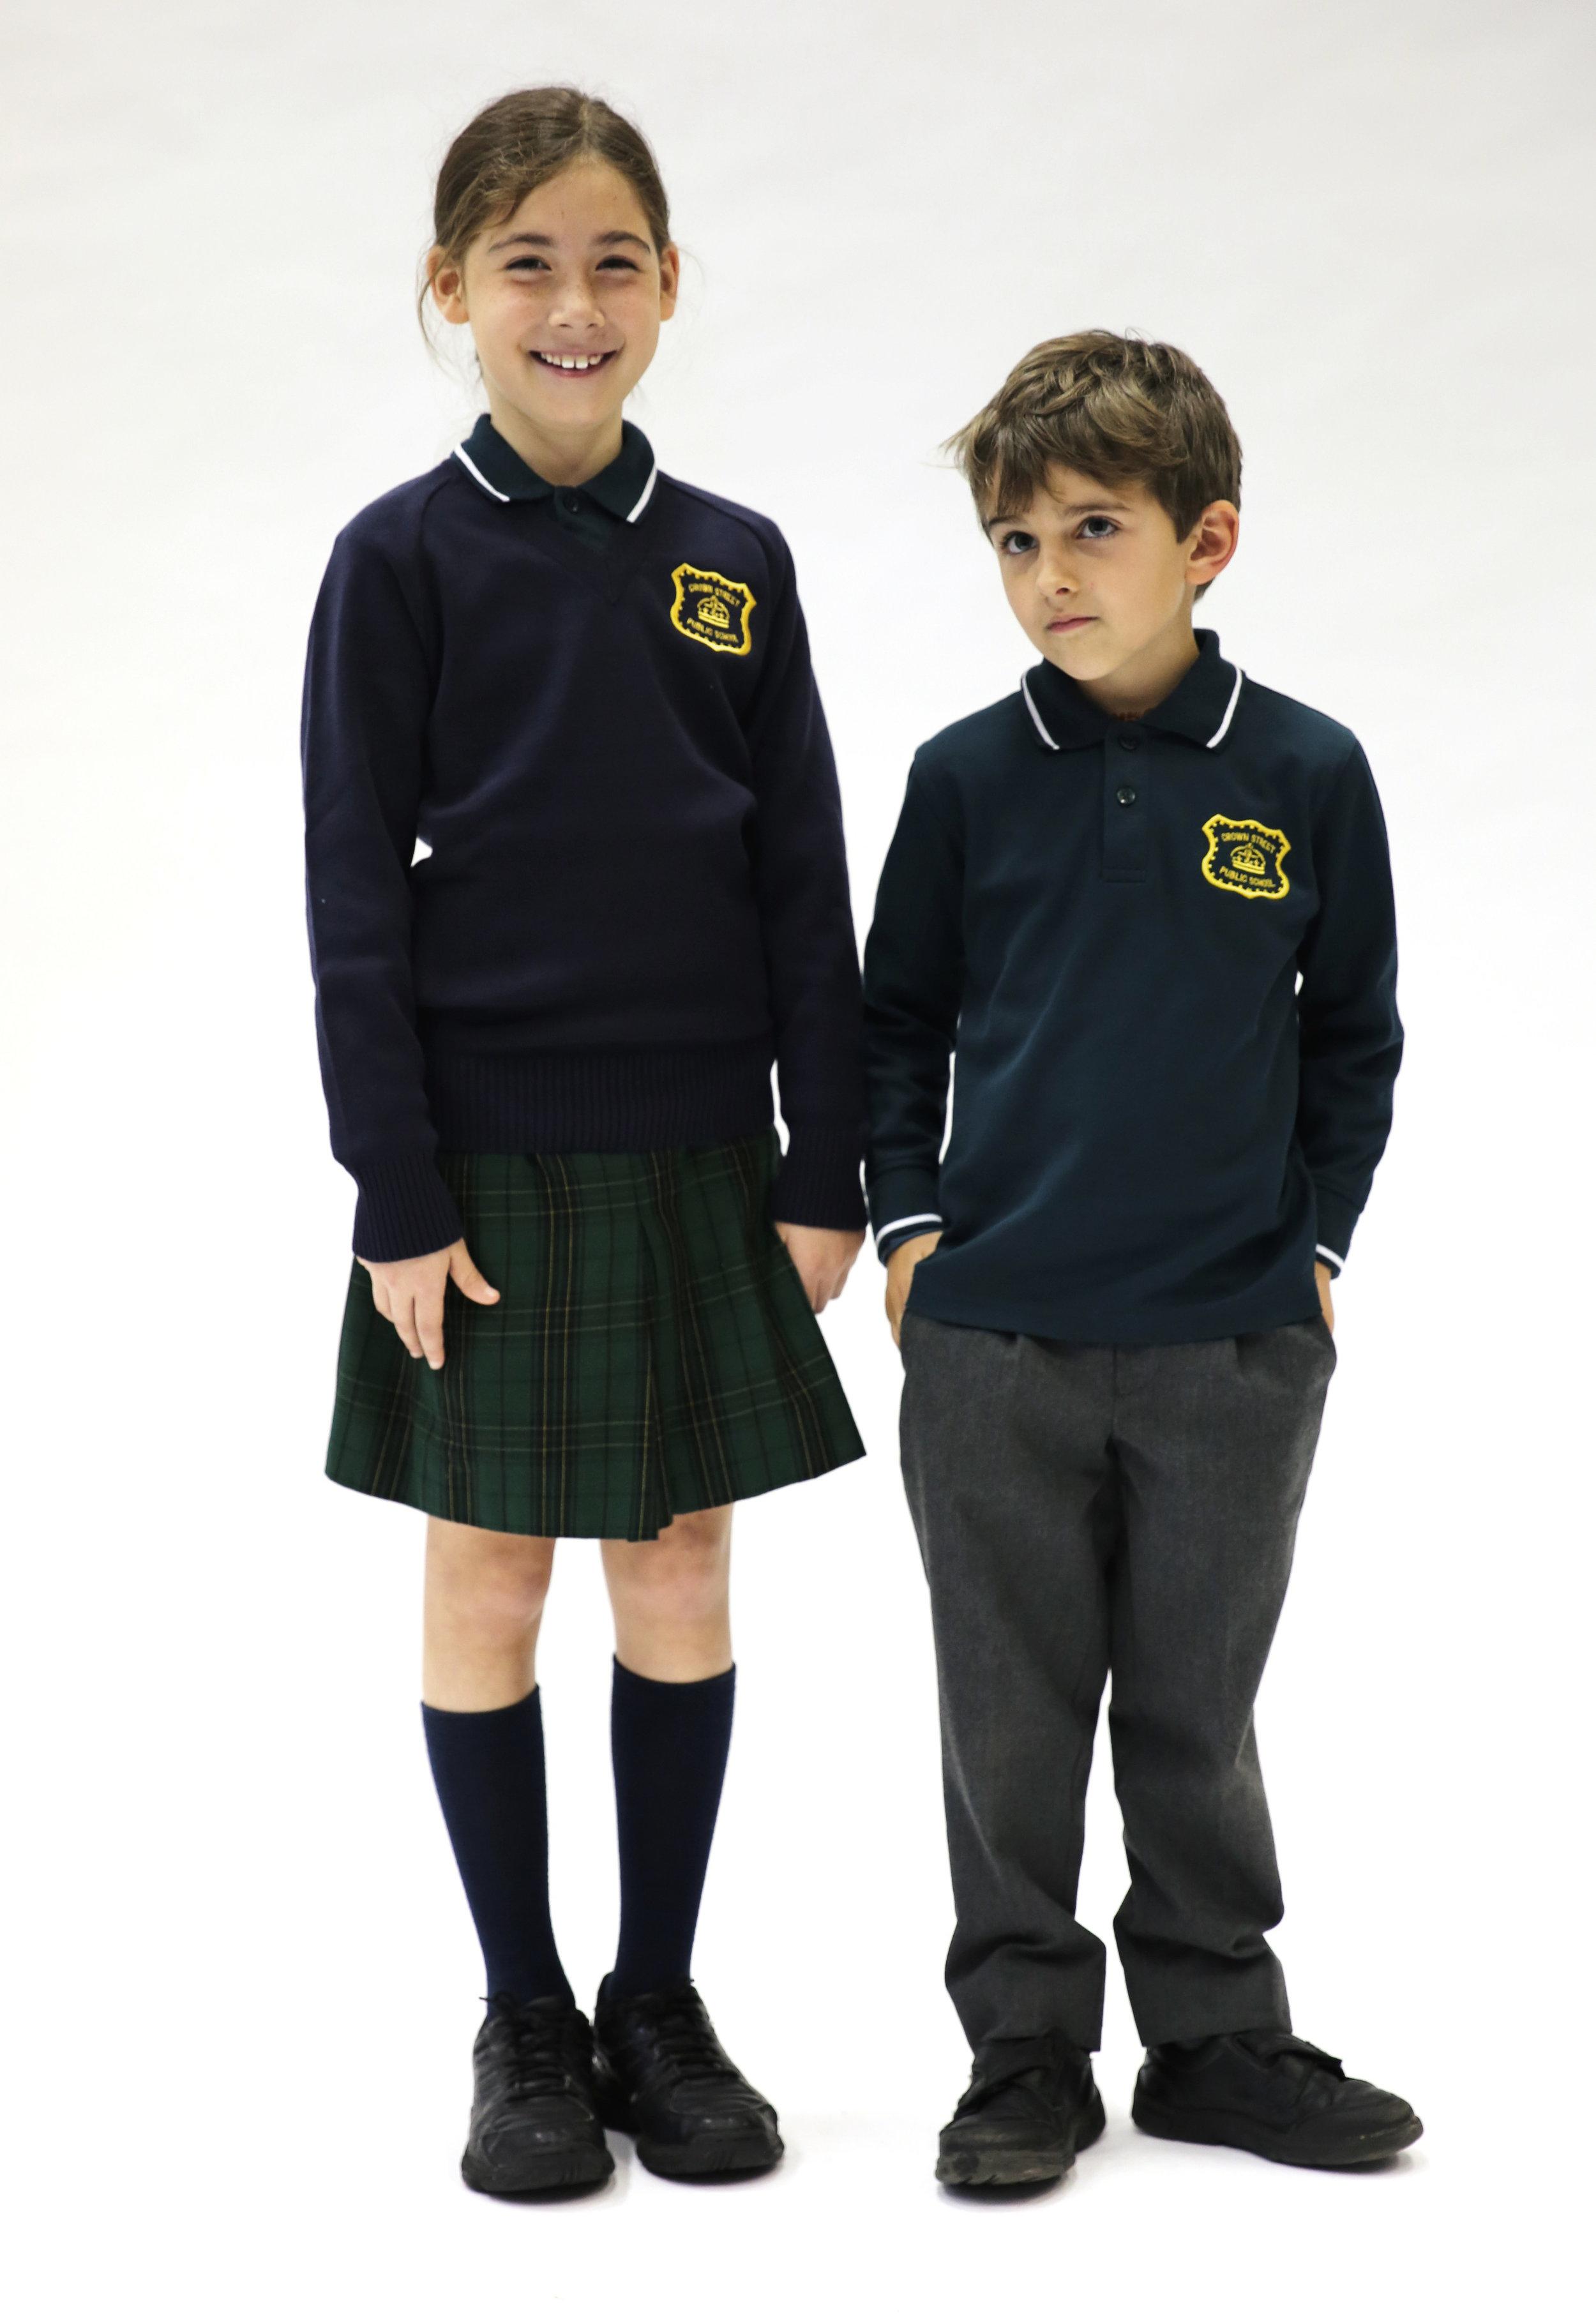 Long sleeve polo, jumper, trousers/skirt